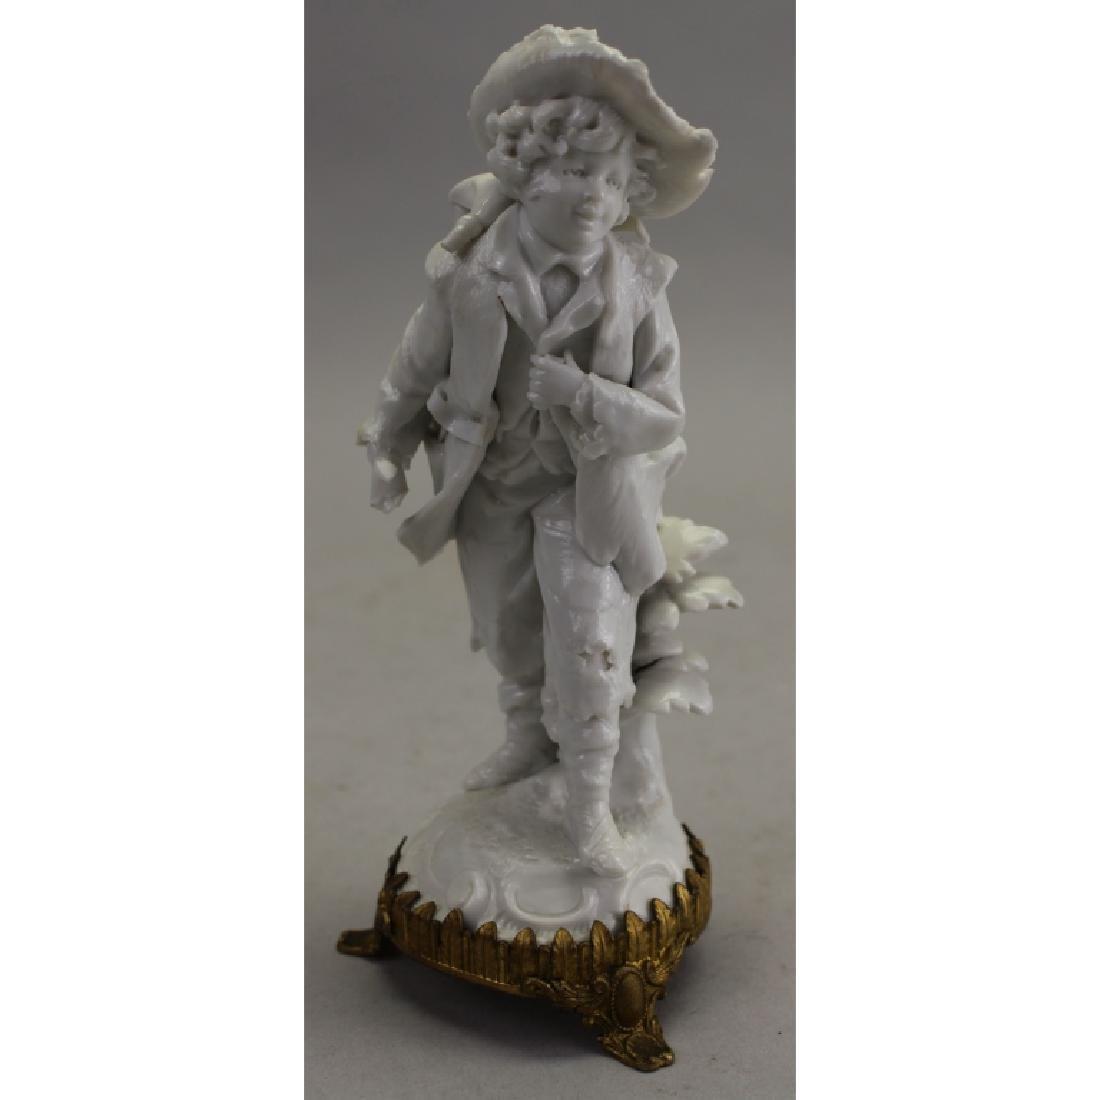 Capodimonte Porcelain Figure